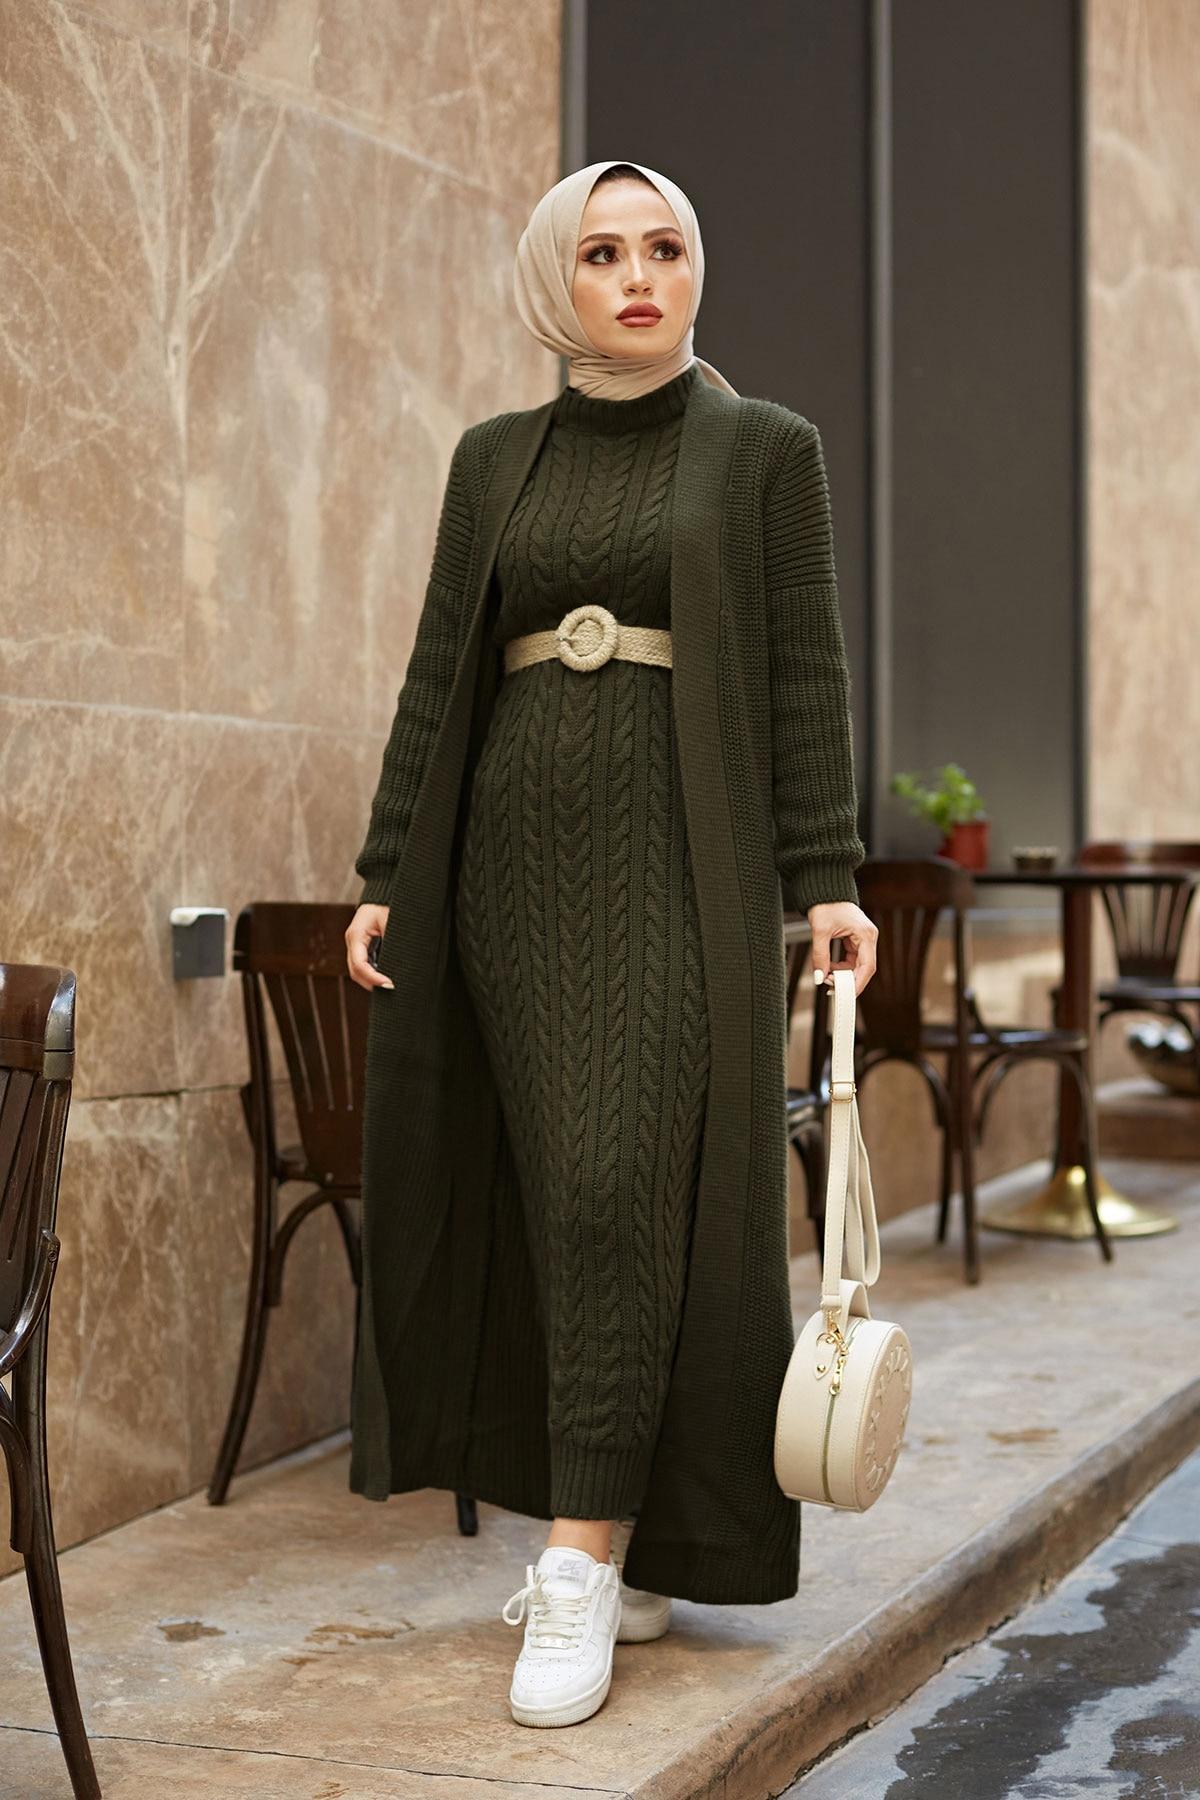 2 Pieces Woman Dress Knitted suit,New version, Color options,thick warm women's dress,Islamic Clothing,Muslim clothings,Turkey Women Women's Clothings Women's Dresses cb5feb1b7314637725a2e7: Anthracite|Beige|Brick|Camel|Fuchsia|Indigo|Light blue|Pine Green|Powder|ROSE|TAN|black|Navy blue|Sky Blue